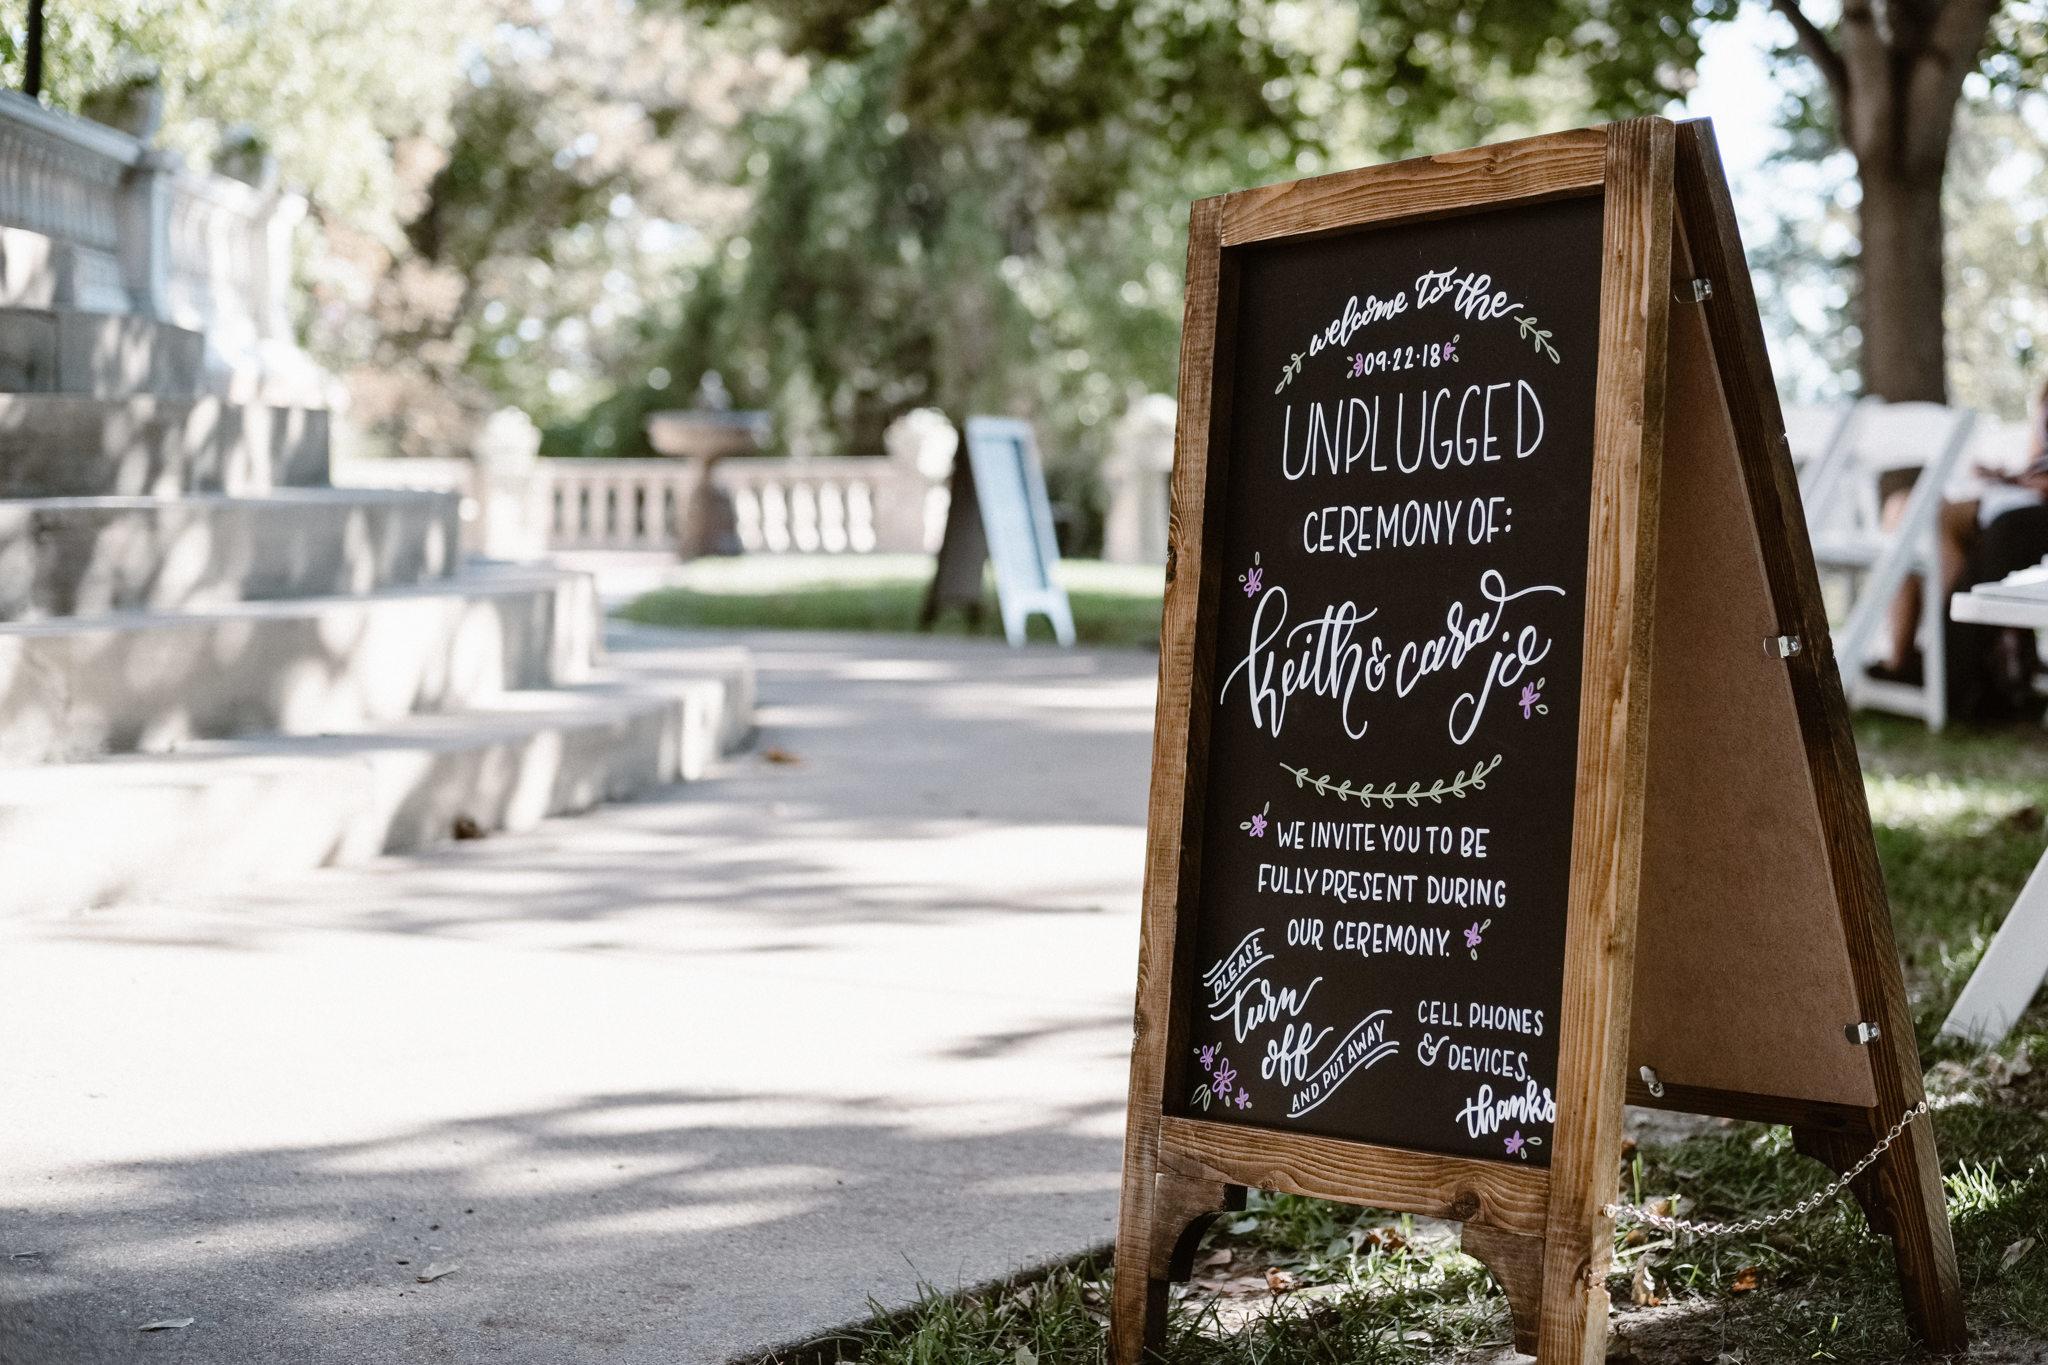 cara-jo-keith-grant-humphreys-mansion-wedding-7-29.jpg